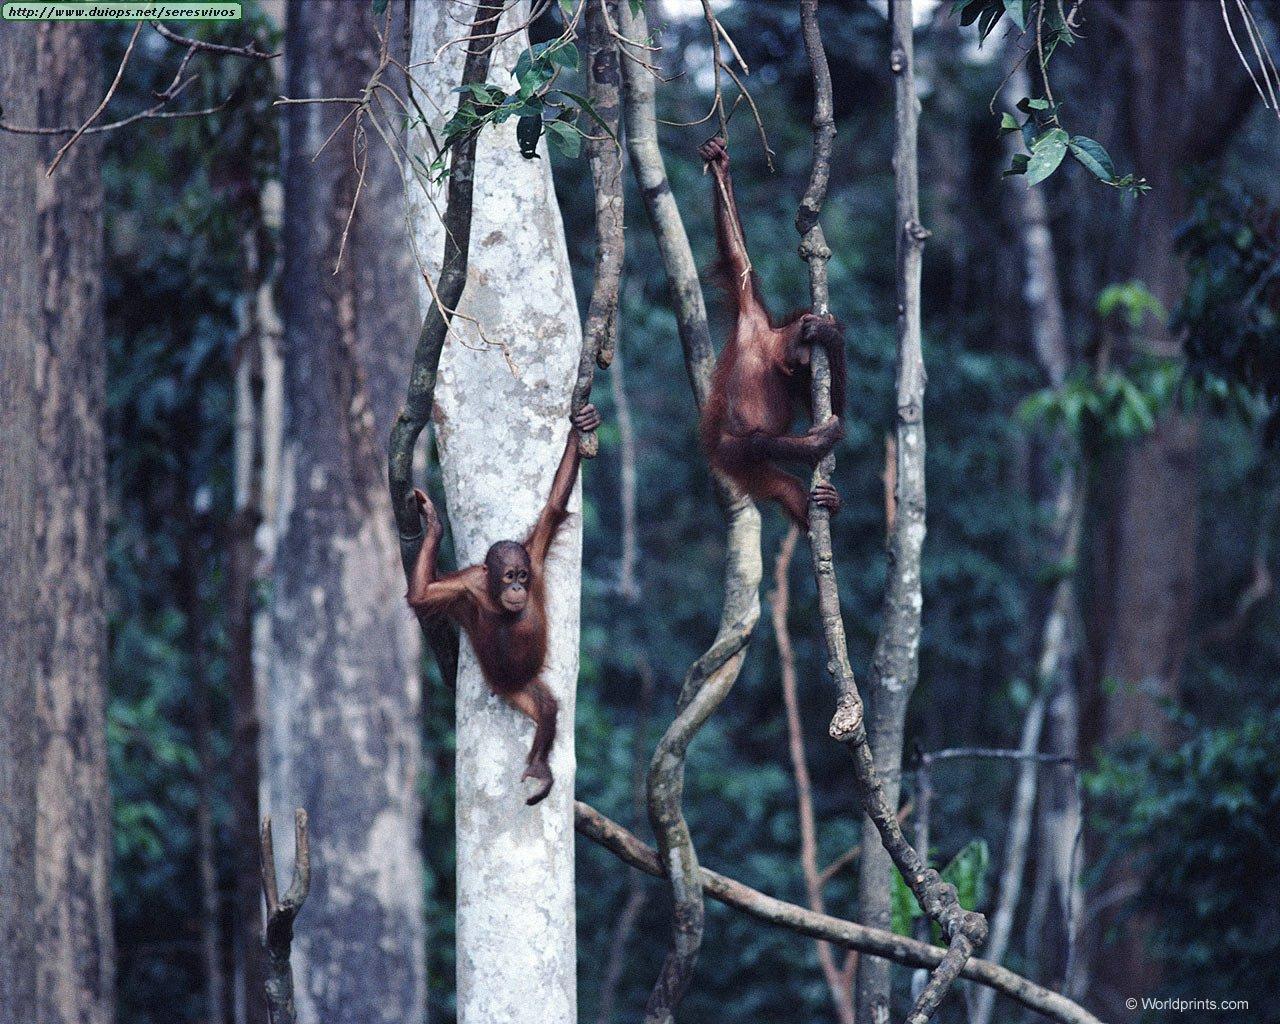 http://www.duiops.net/seresvivos/galeria/orangutanes/nwe280.jpg